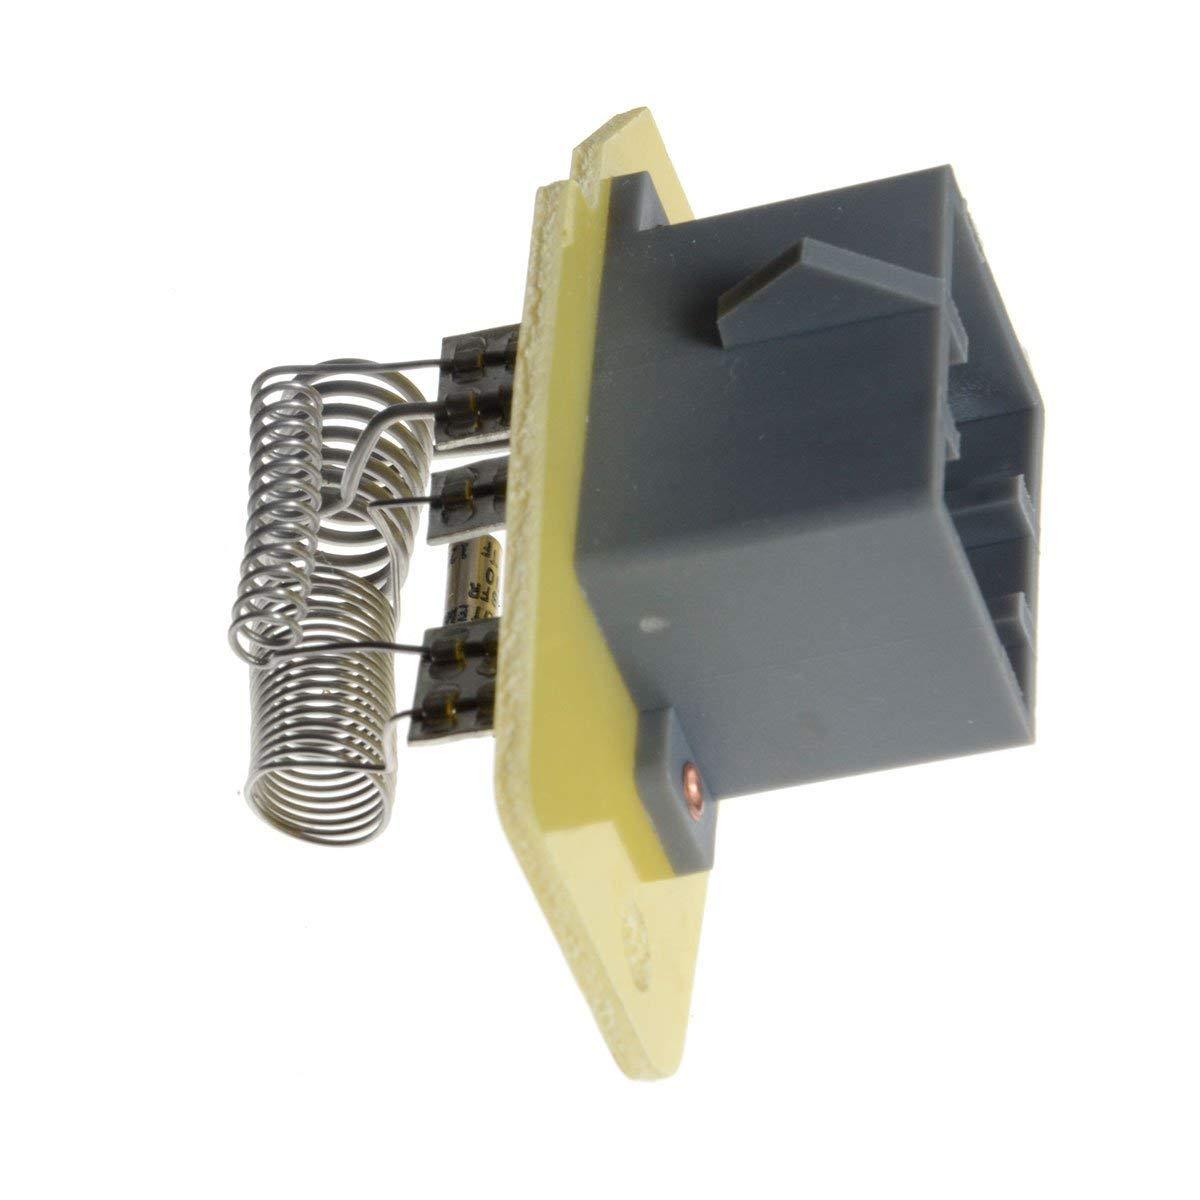 J-973-011 A/C Air Conditioning Heater Fan HVAC Blower Motor ...